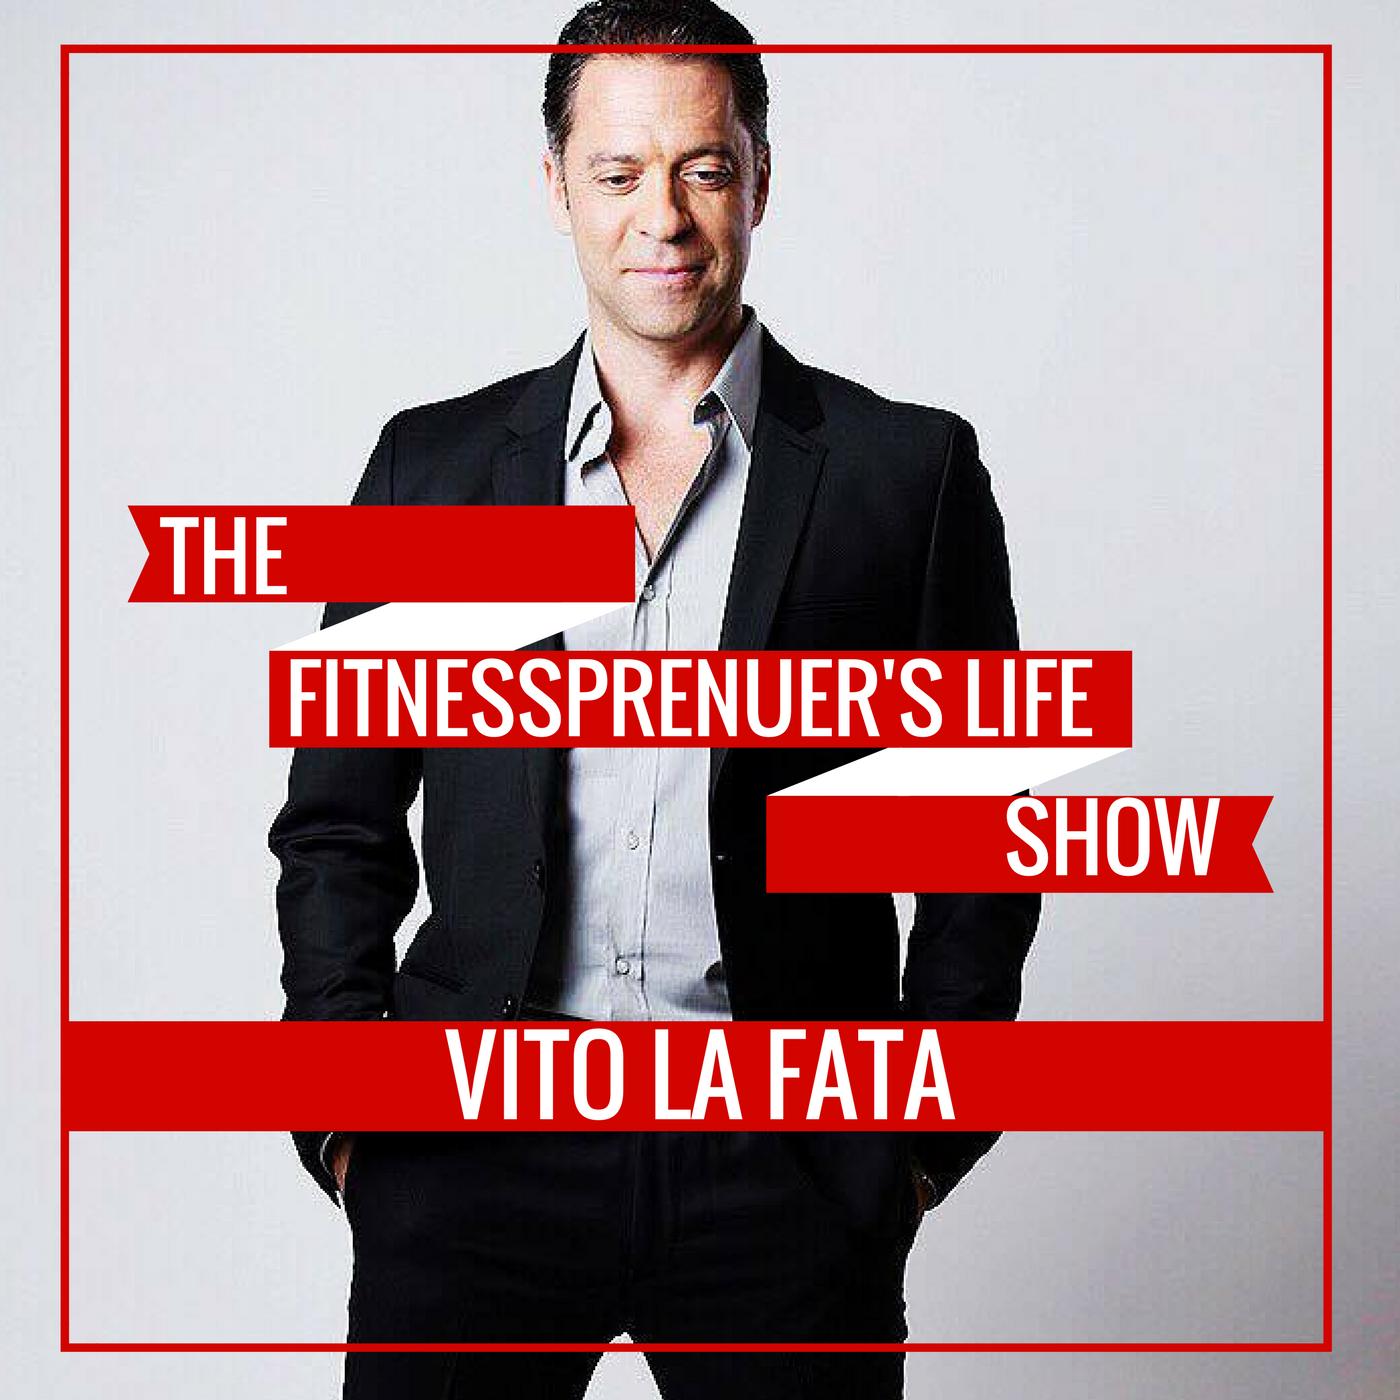 Fitnesspreneur's Life